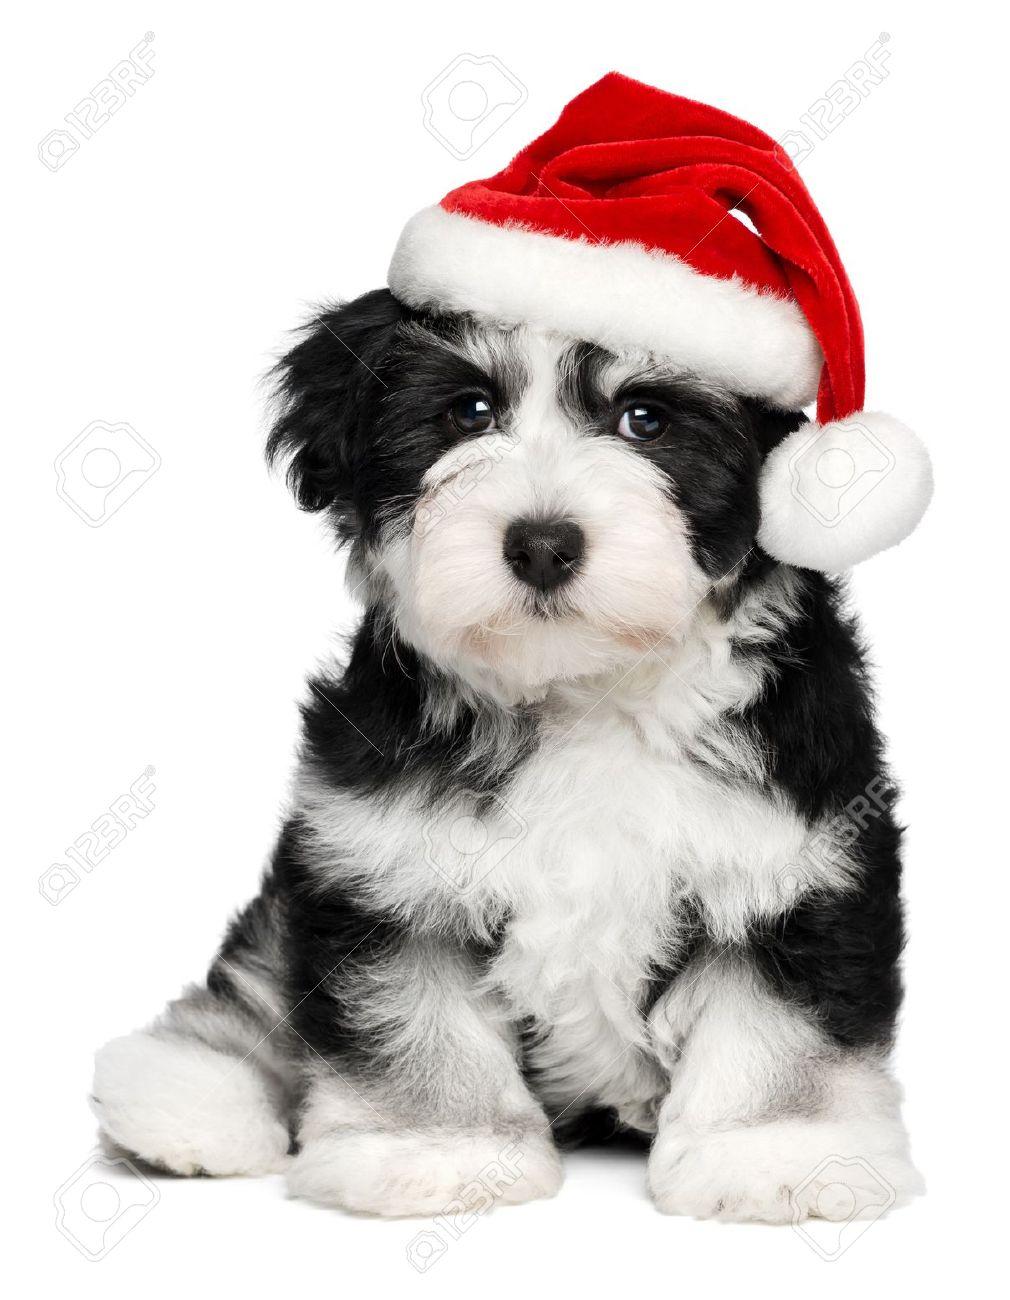 Sitting Bichon Havanese Puppy Dog In A Christmas Santa